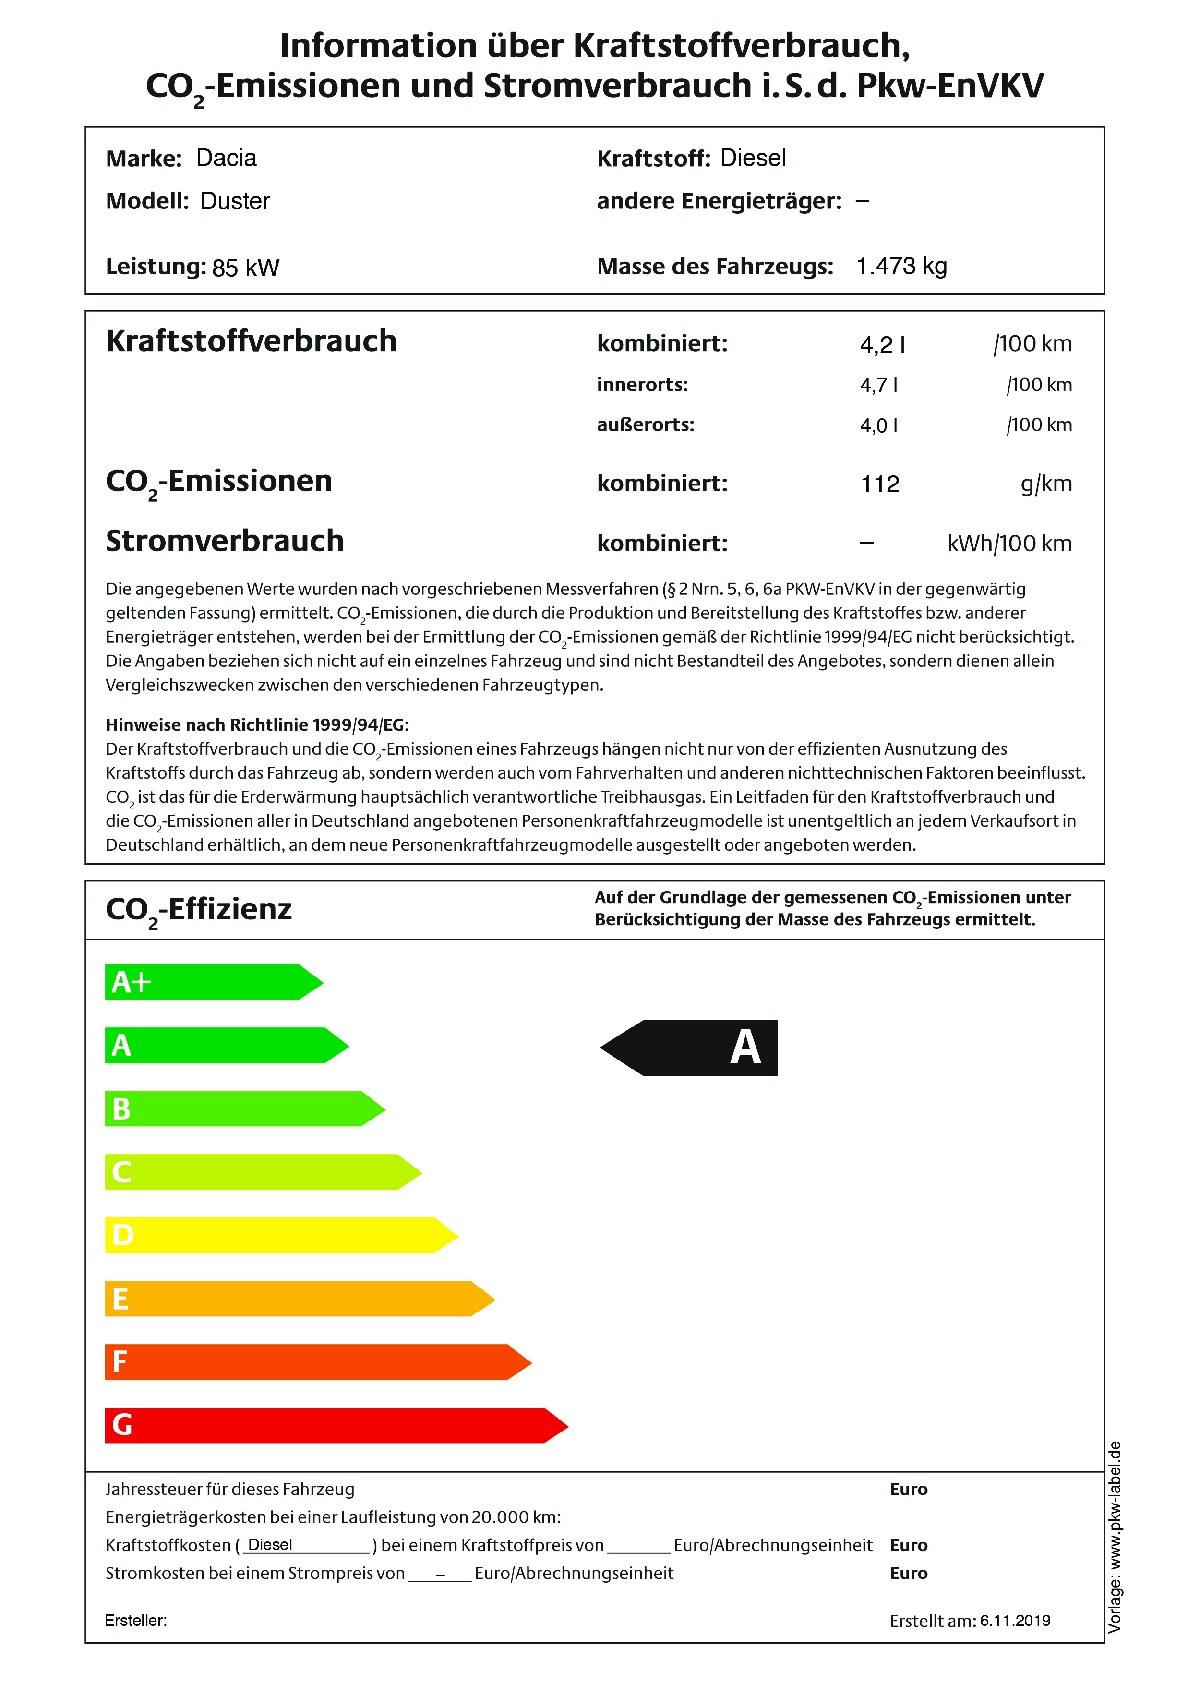 Energielabel Blue dCi 115 4x2